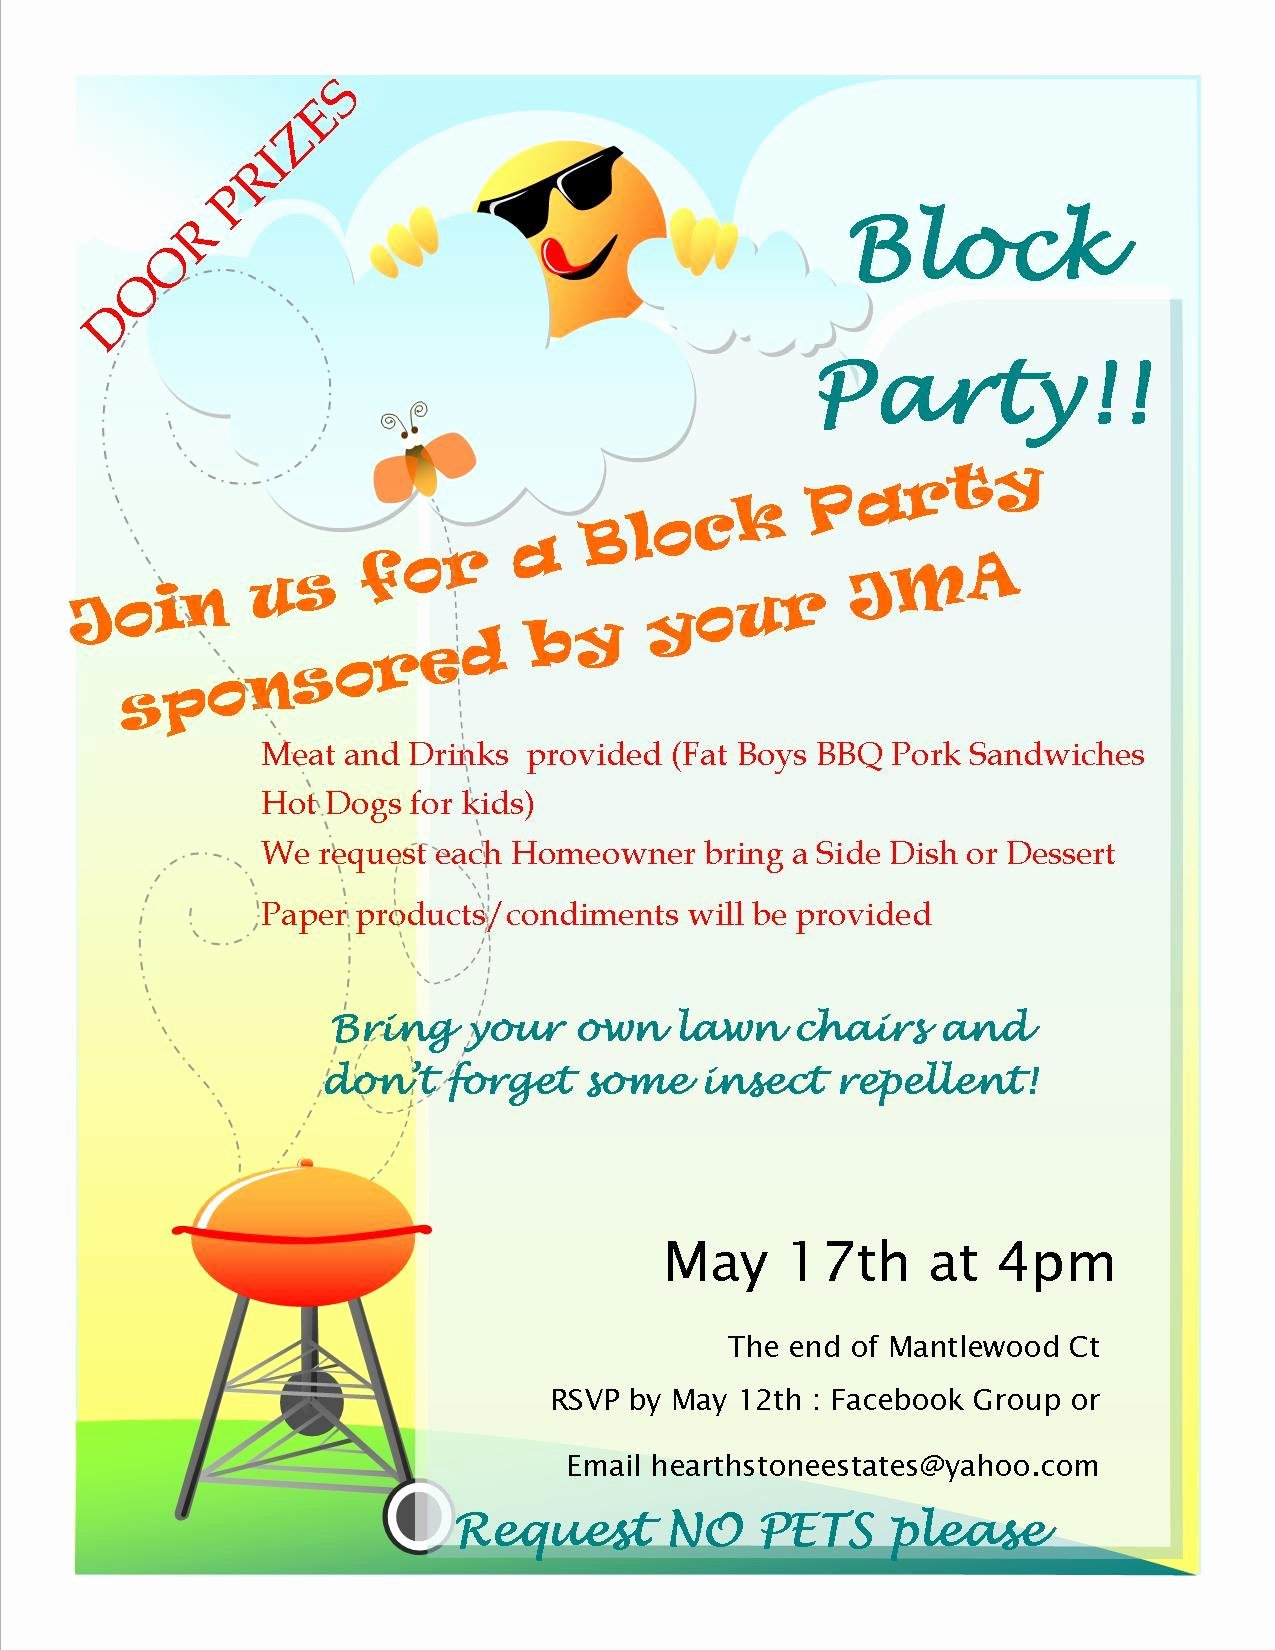 Neighborhood Block Party Flyer Template Elegant Block Party Flyer